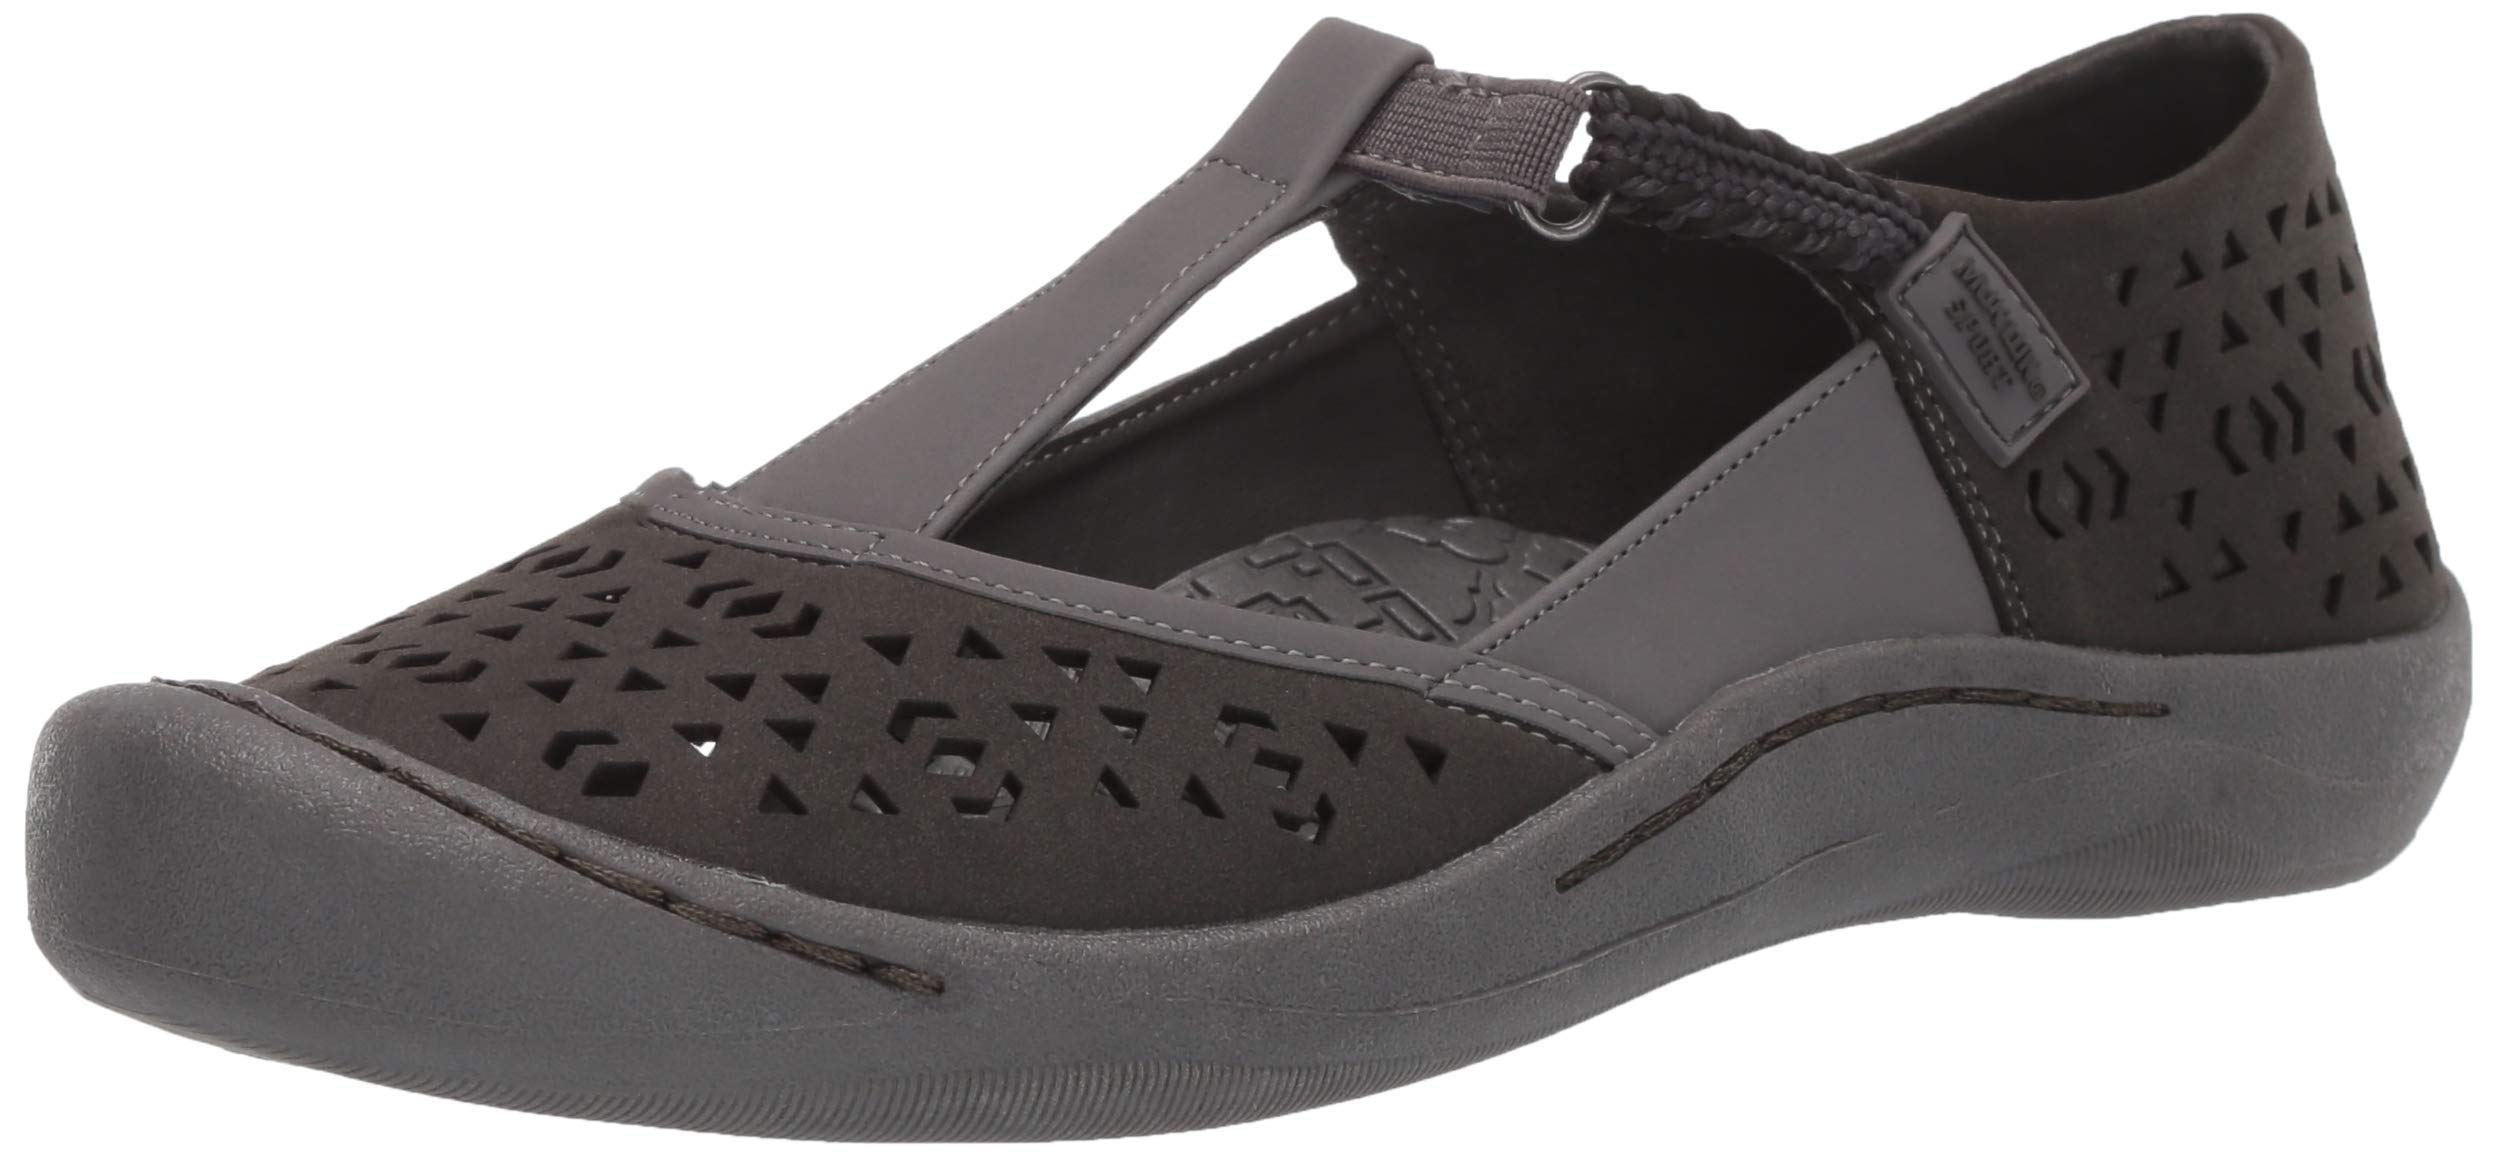 MUK LUKS Women's Women's Samantha Sport Shoe-Grey Sandal, Grey, 6 M US